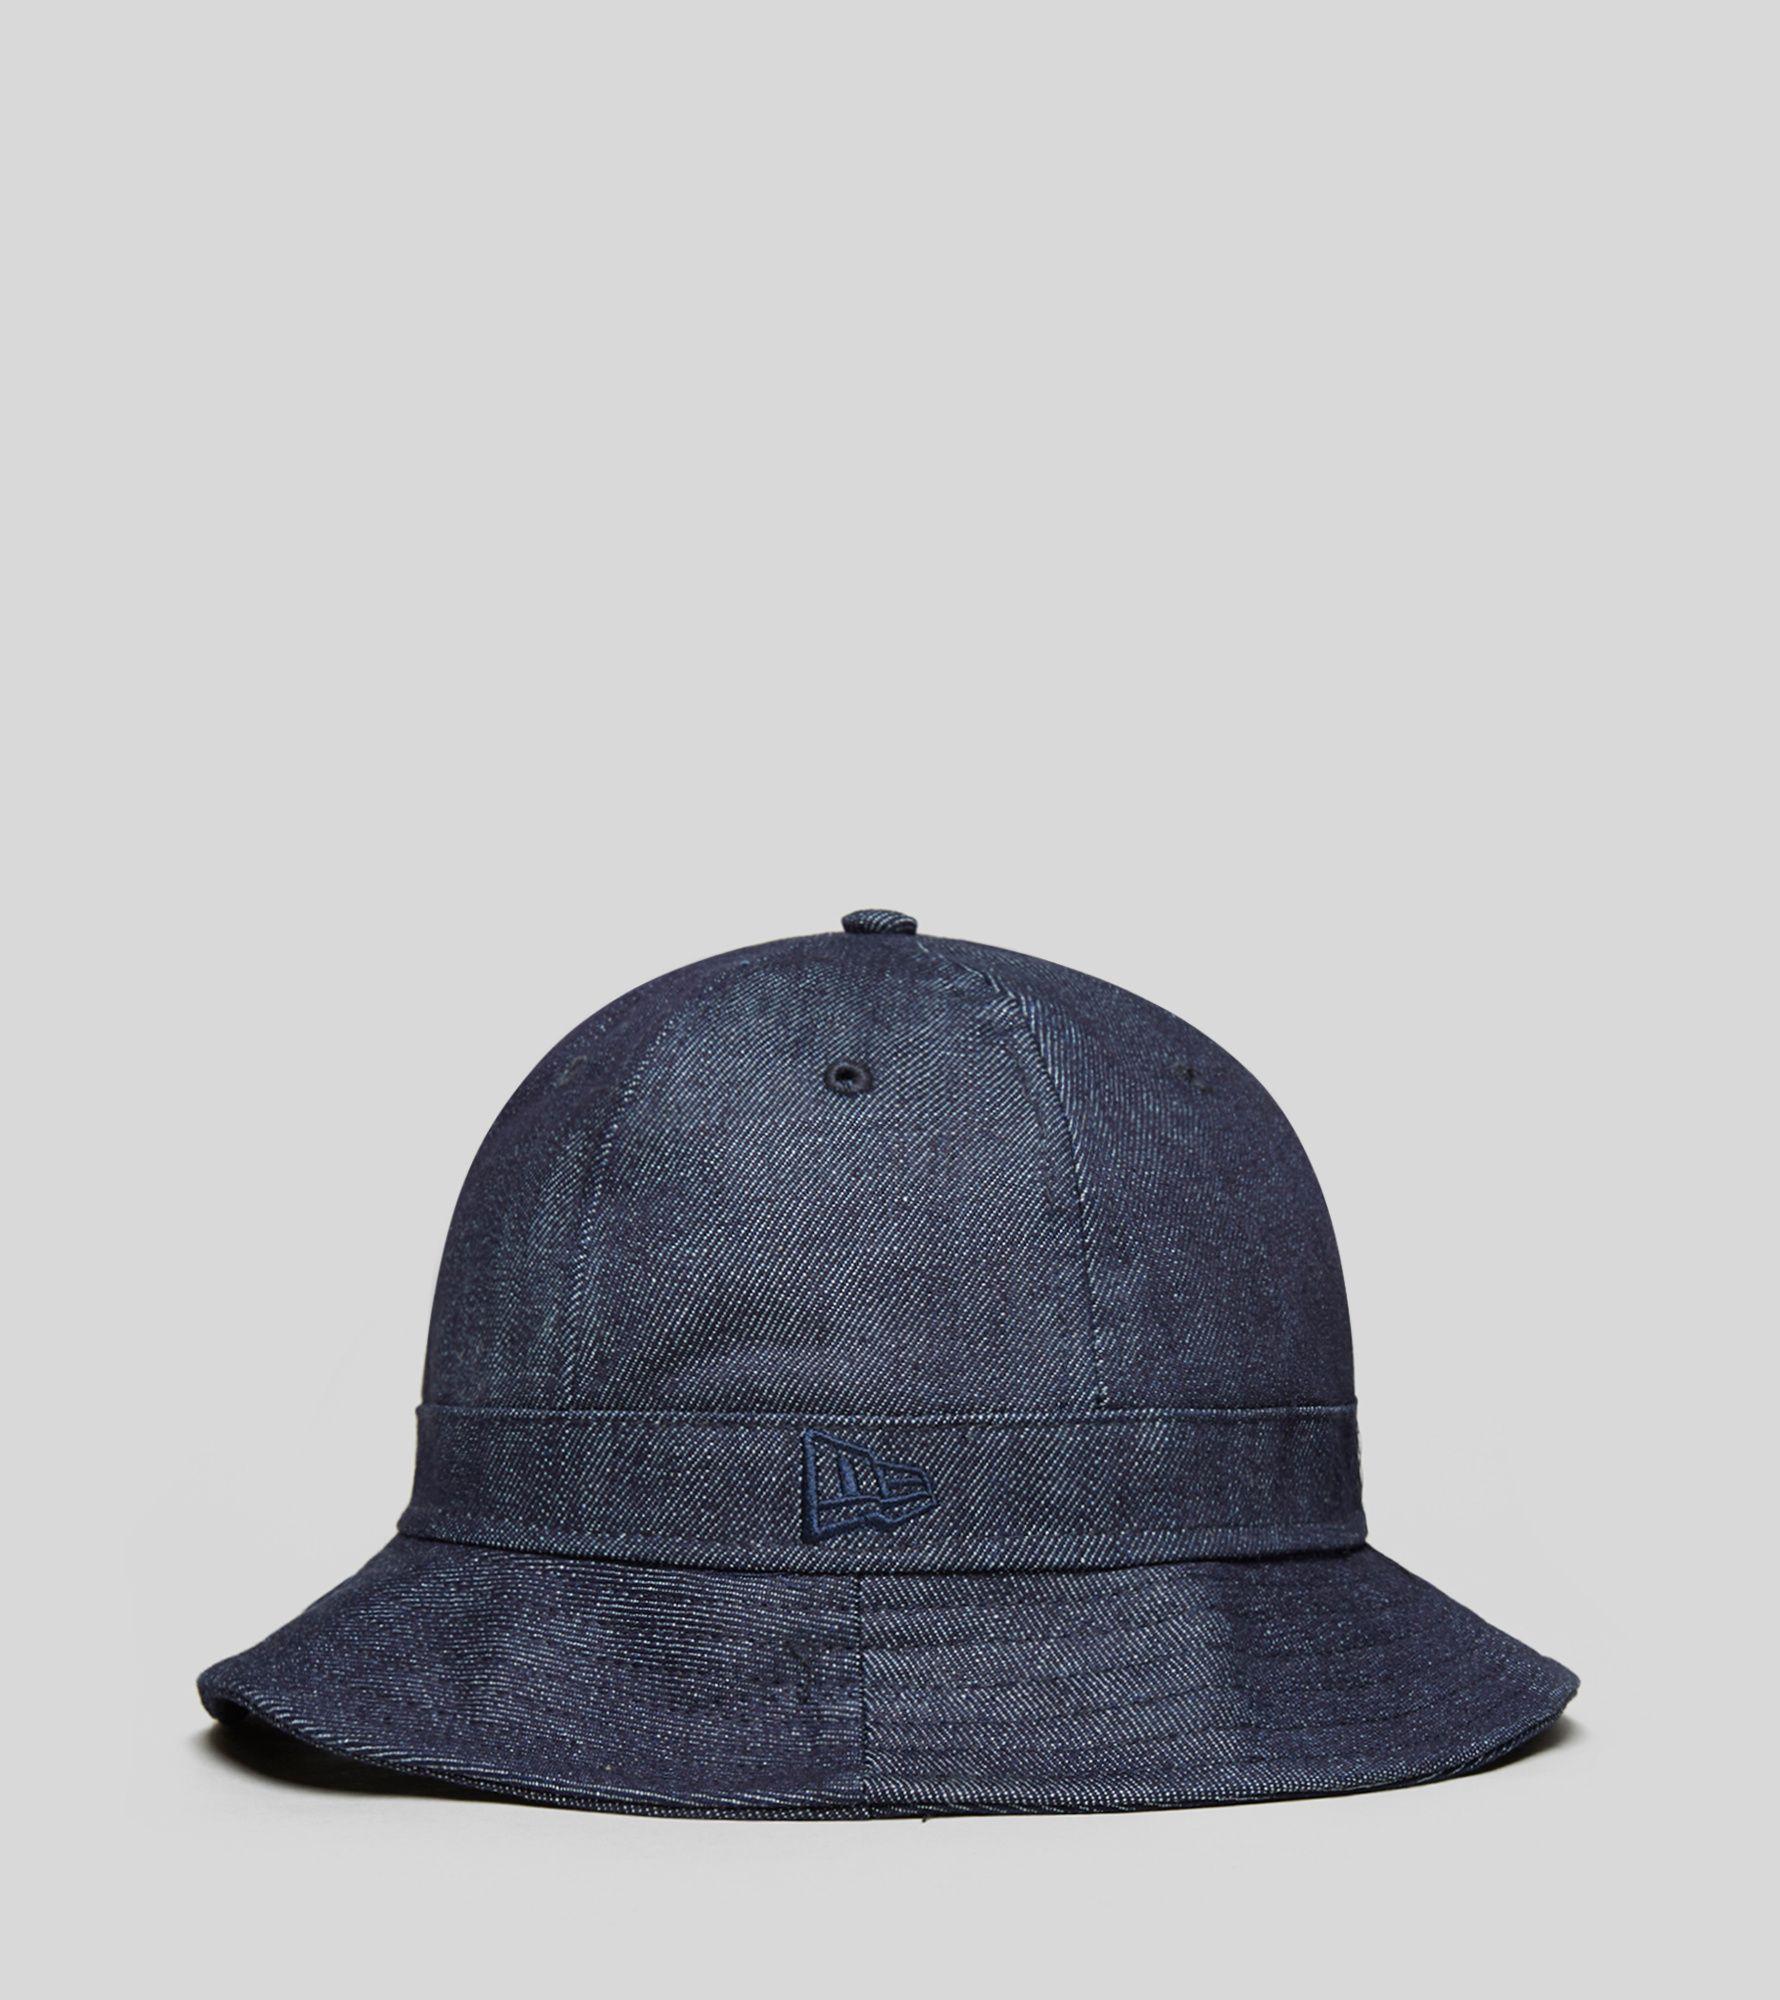 ... switzerland new era explorer bucket hat size exclusive 2a8f7 3209e eaf7c58d574c